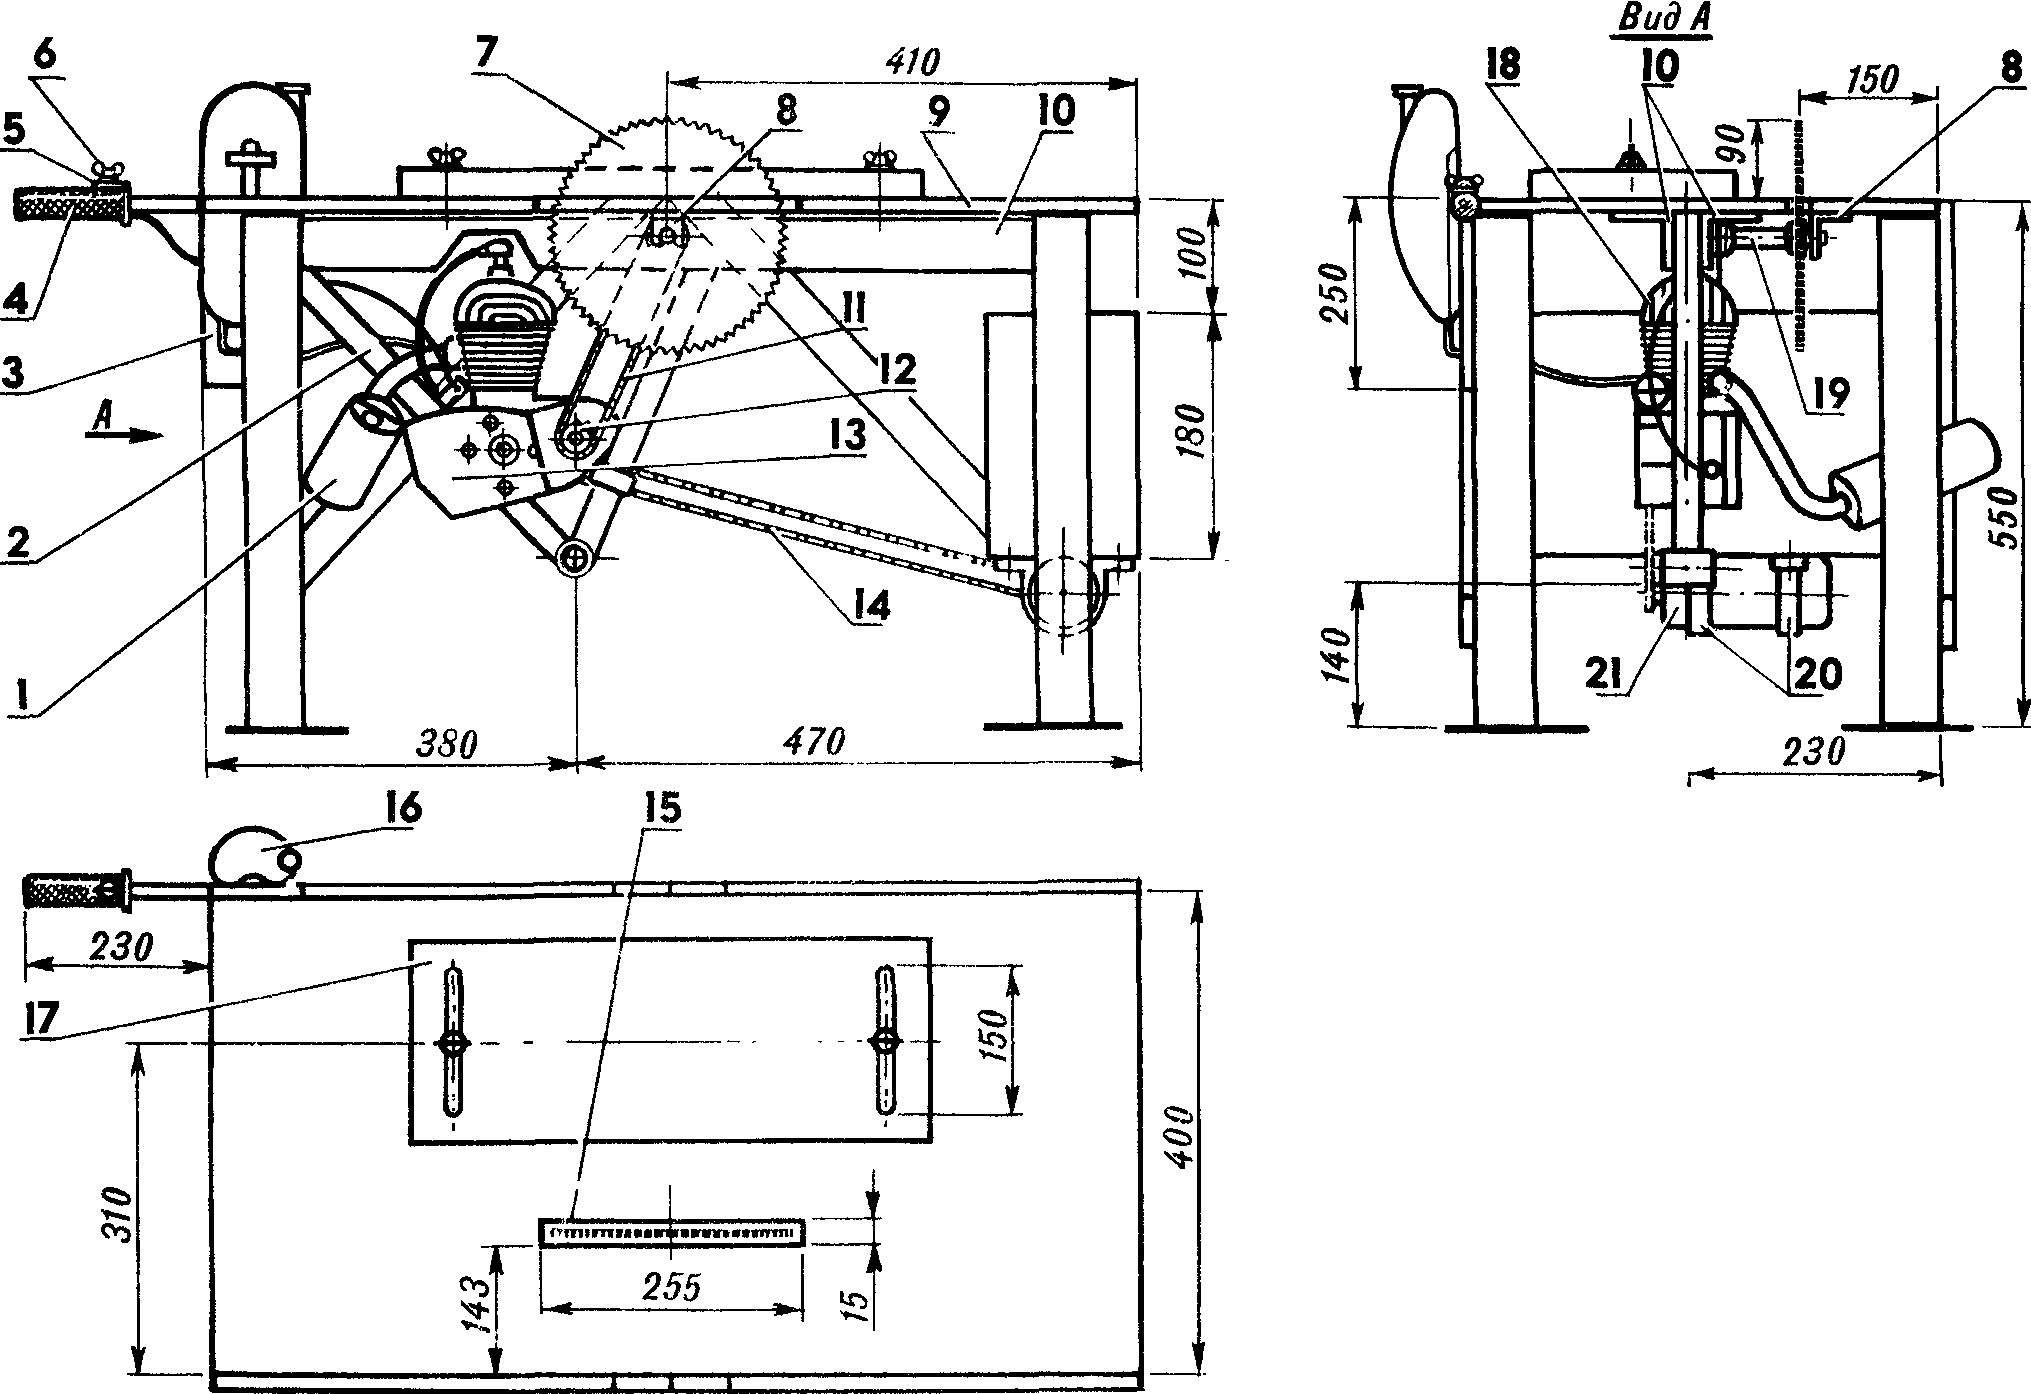 Fig. 1. Gasoline chain saw machine is the generator.